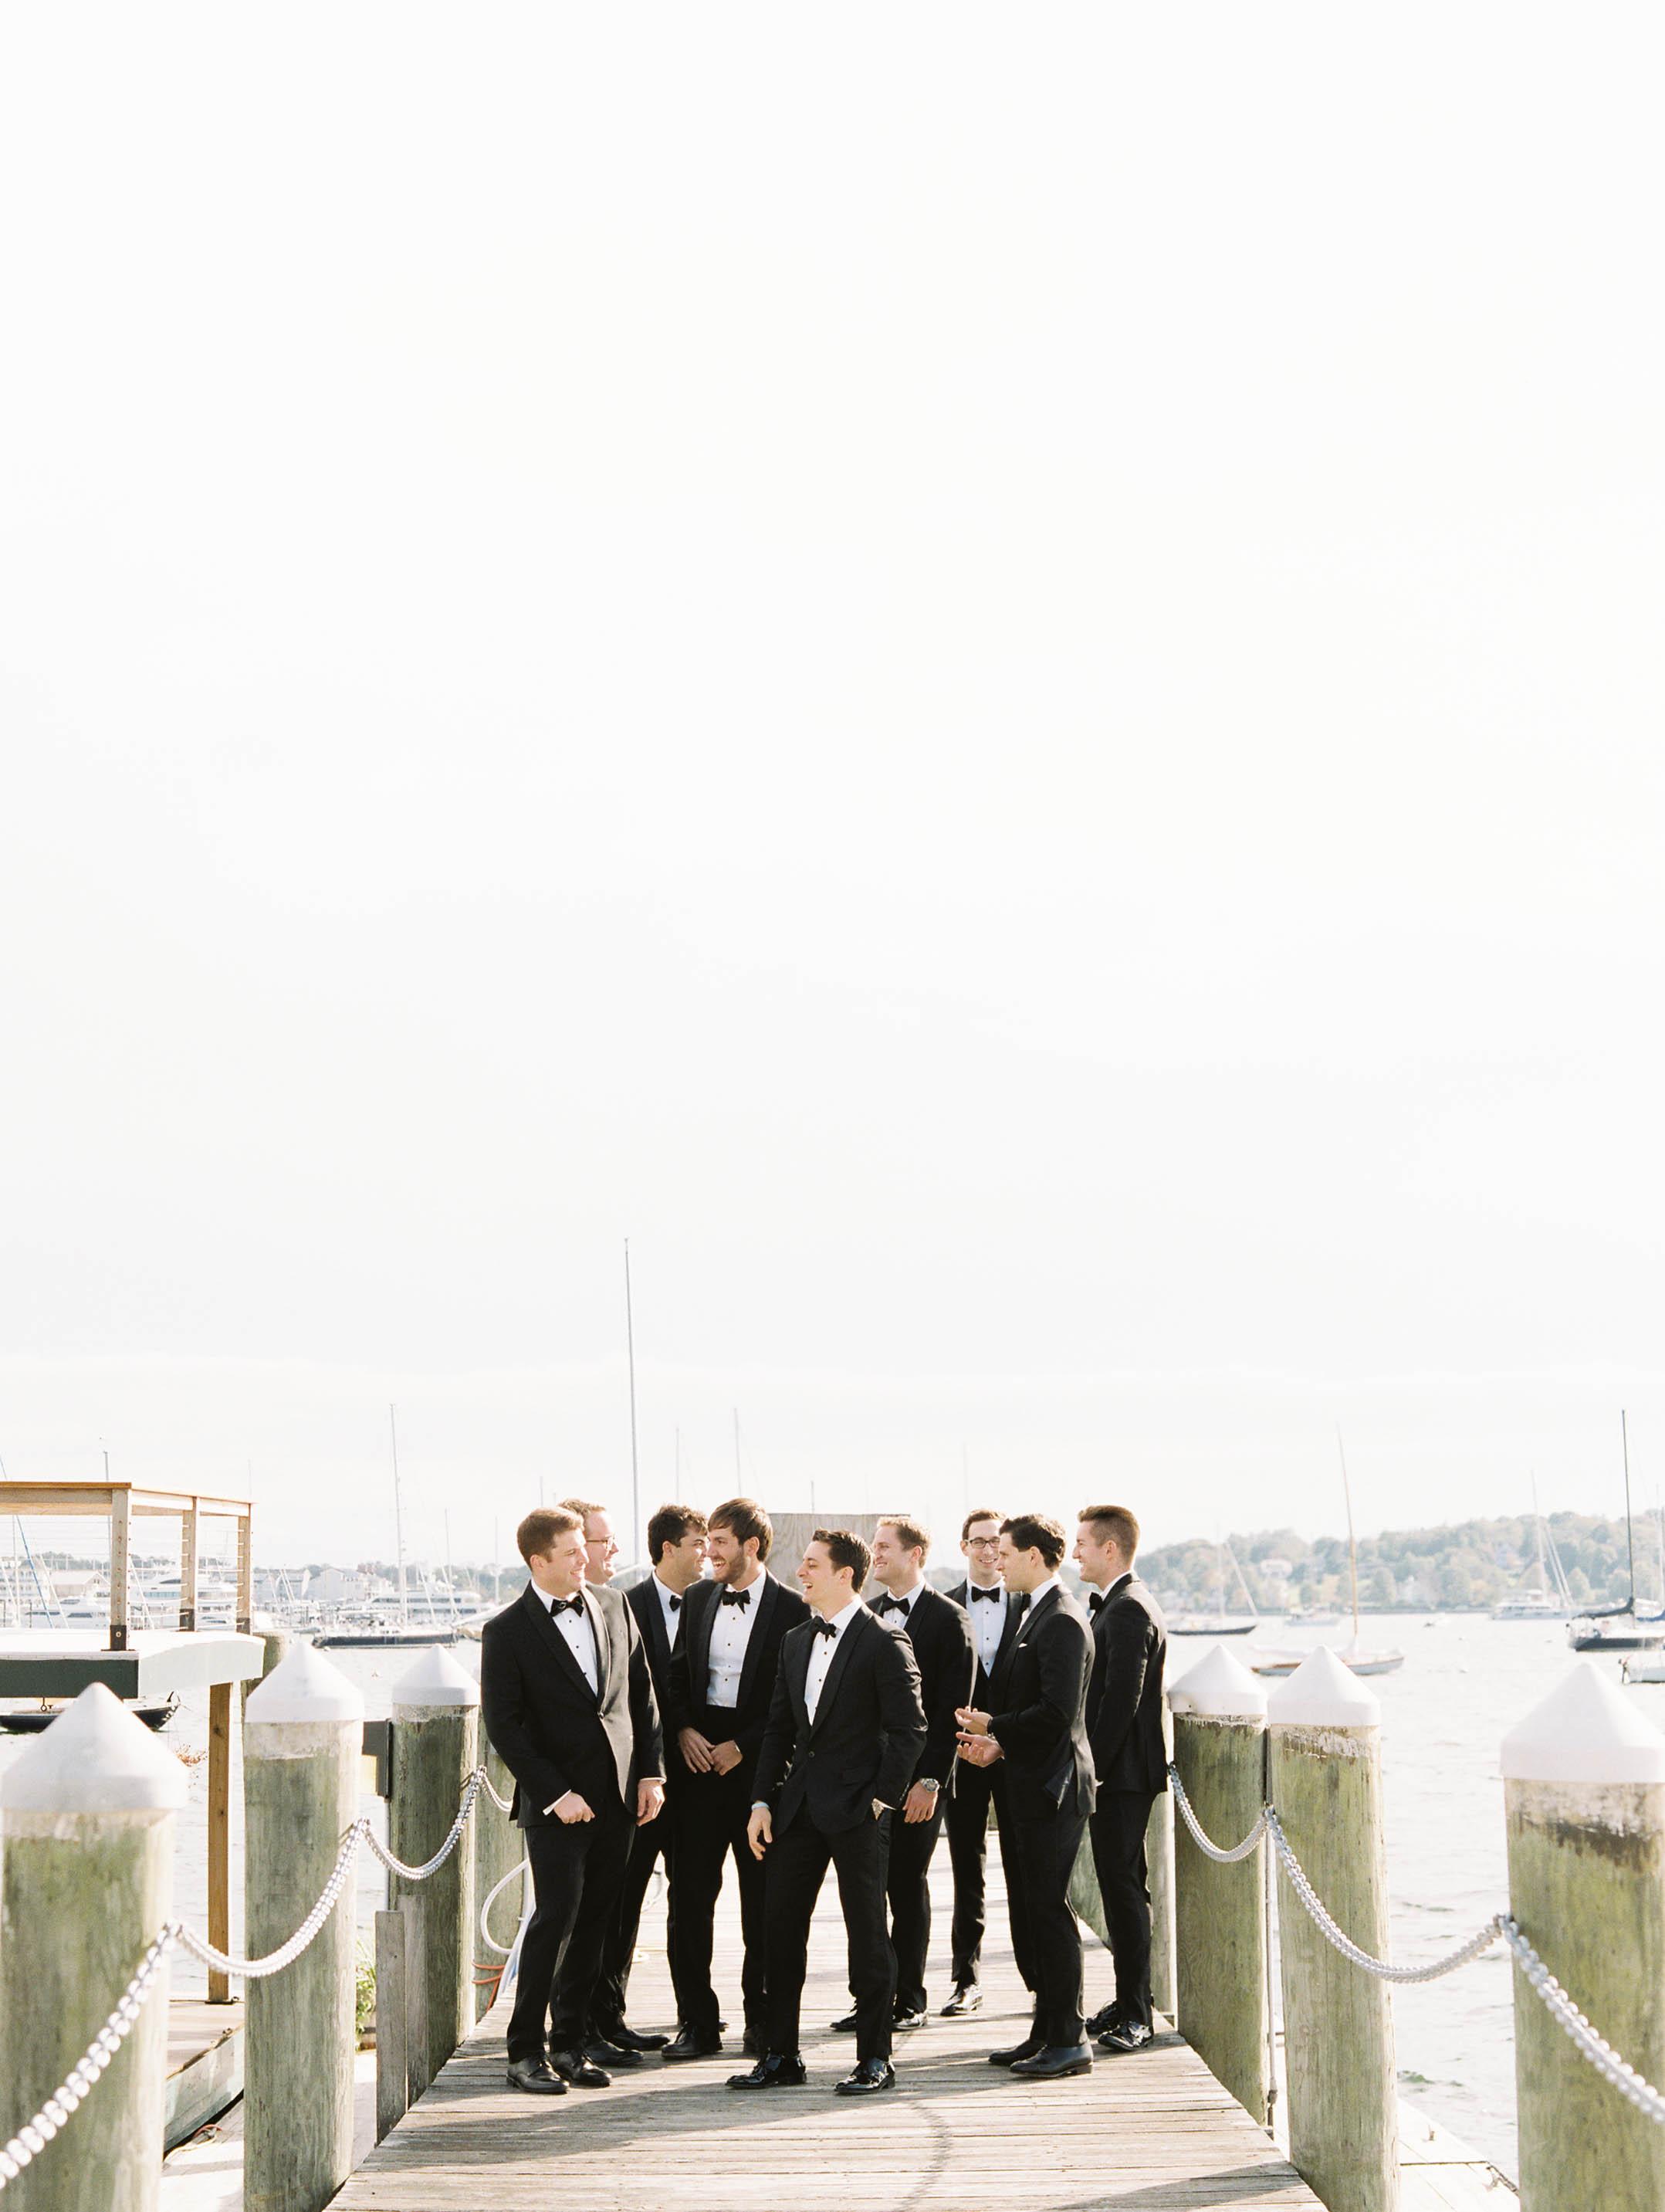 kelsandmichael_weddingphotography_rhodeislandwedding-1.jpg